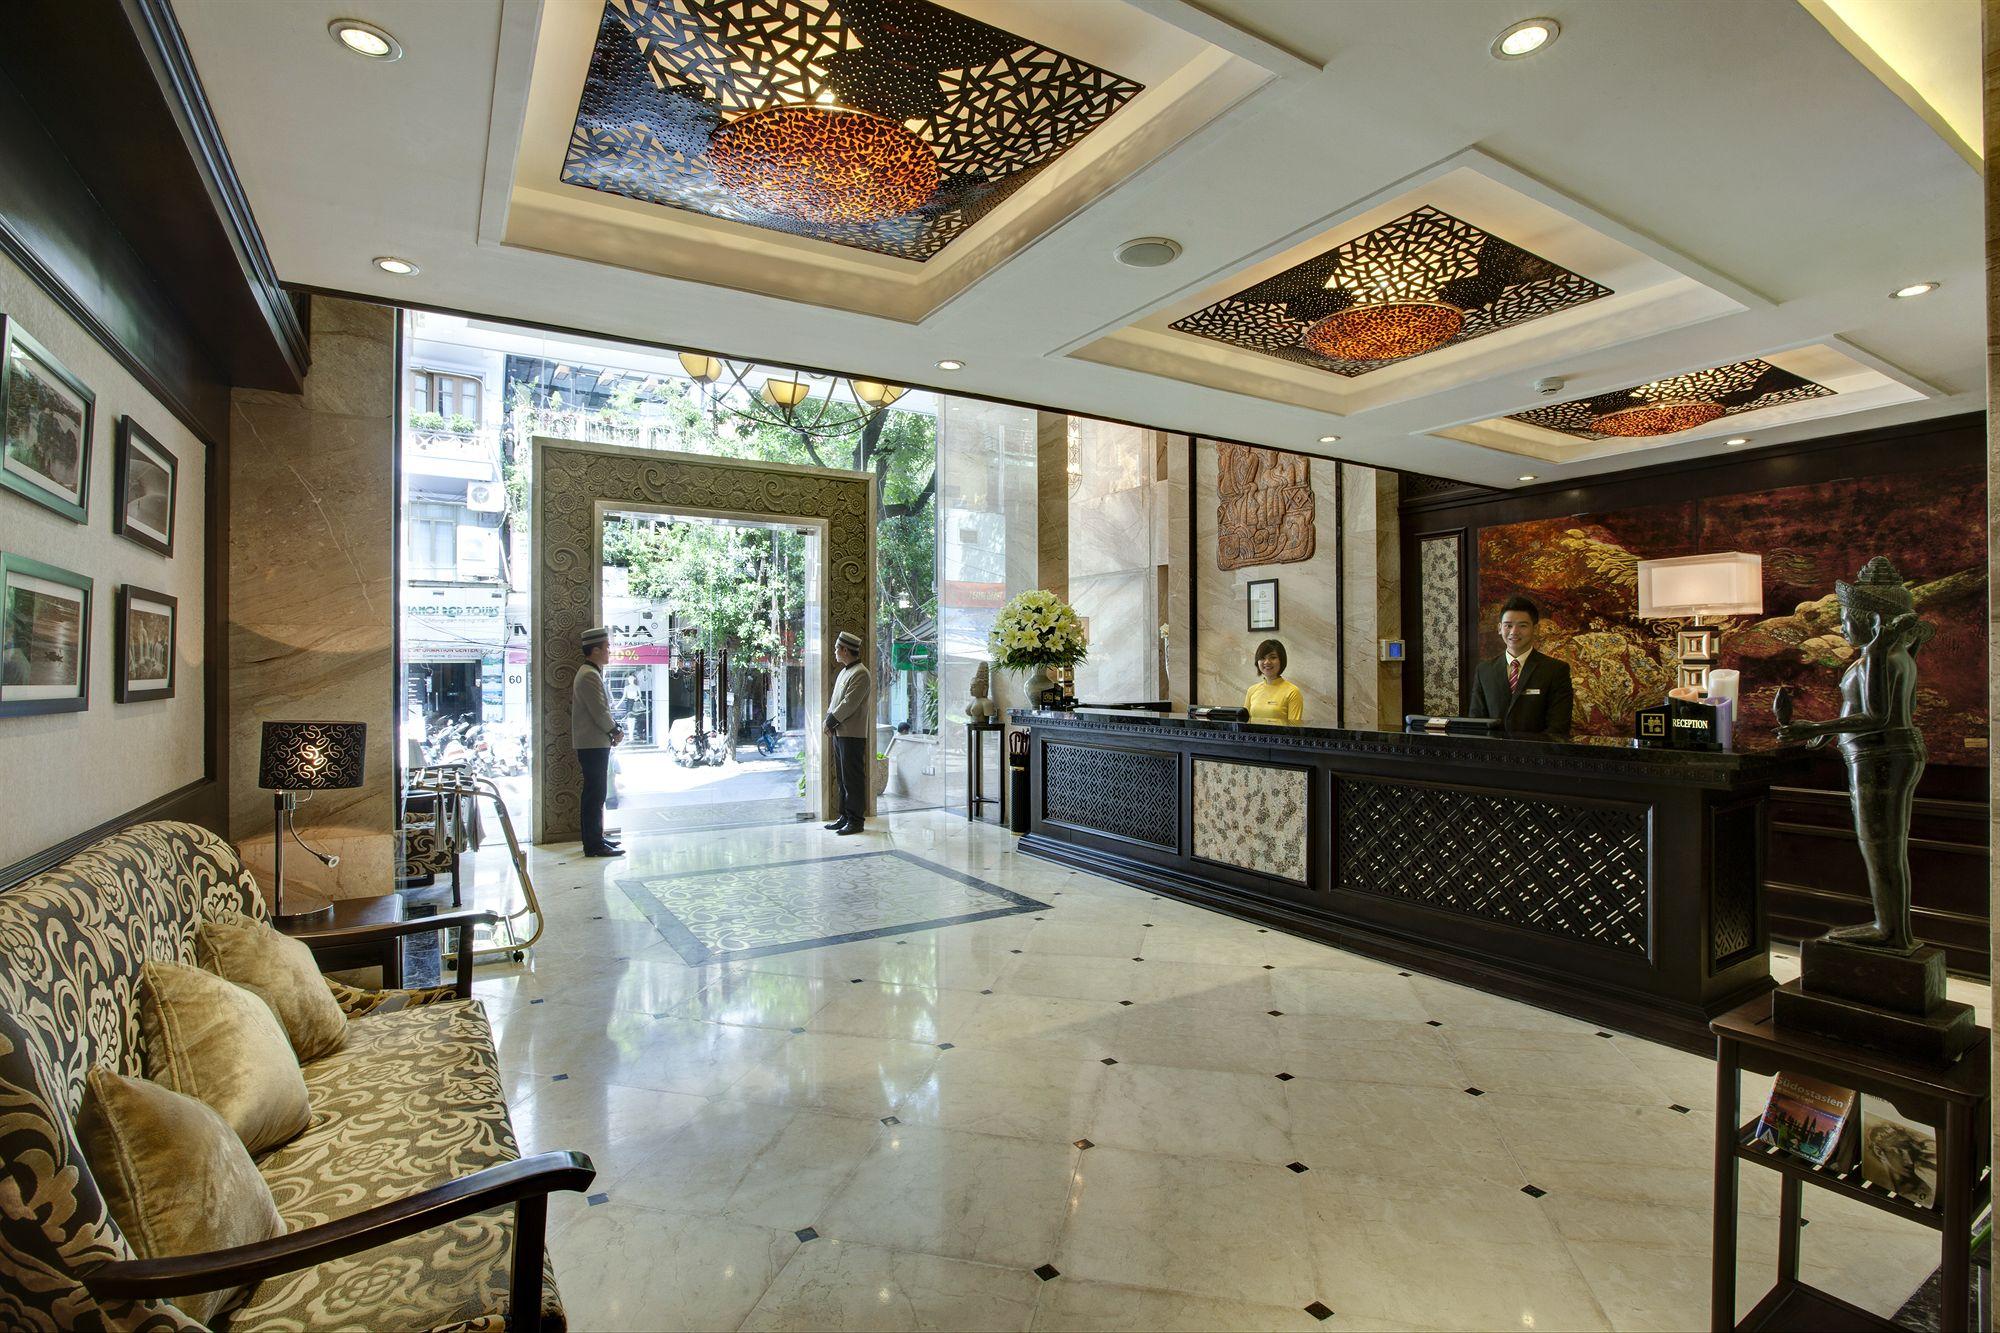 Golden Lotus Luxury Hotel - Vietnam - HANOI